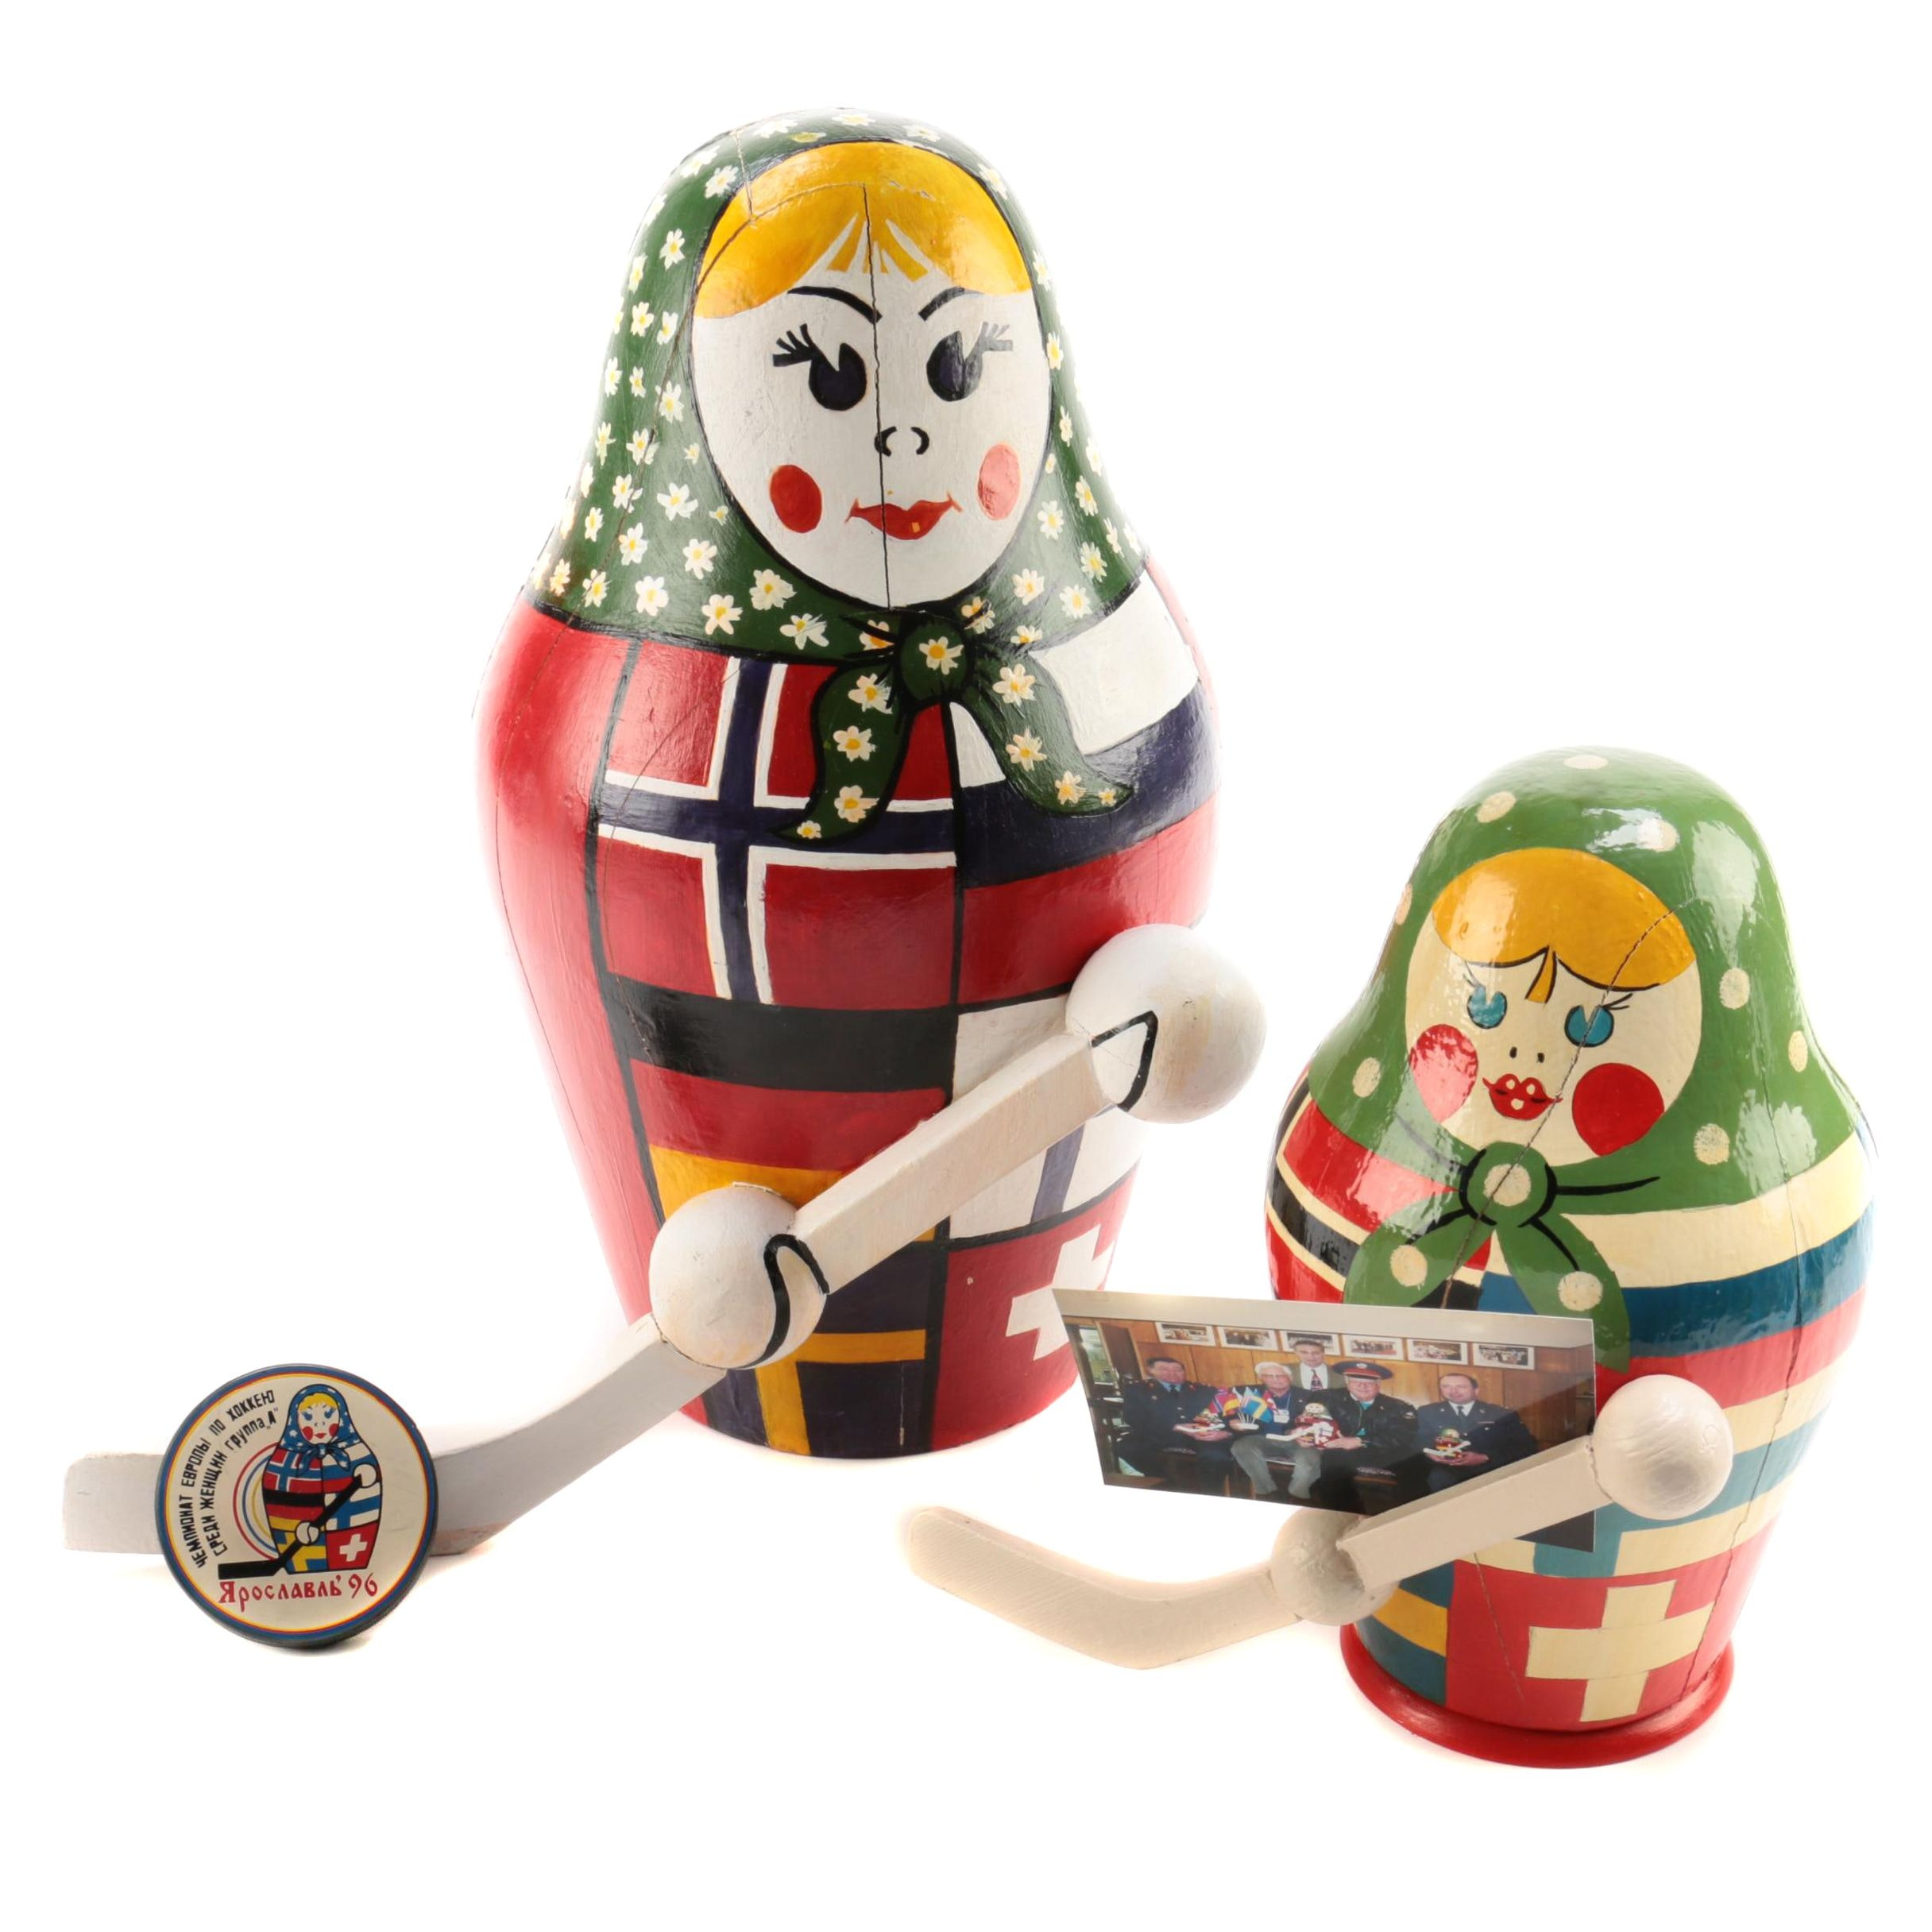 1996 Women's World Hockey Championship Russian Dolls and Commemorative Puck